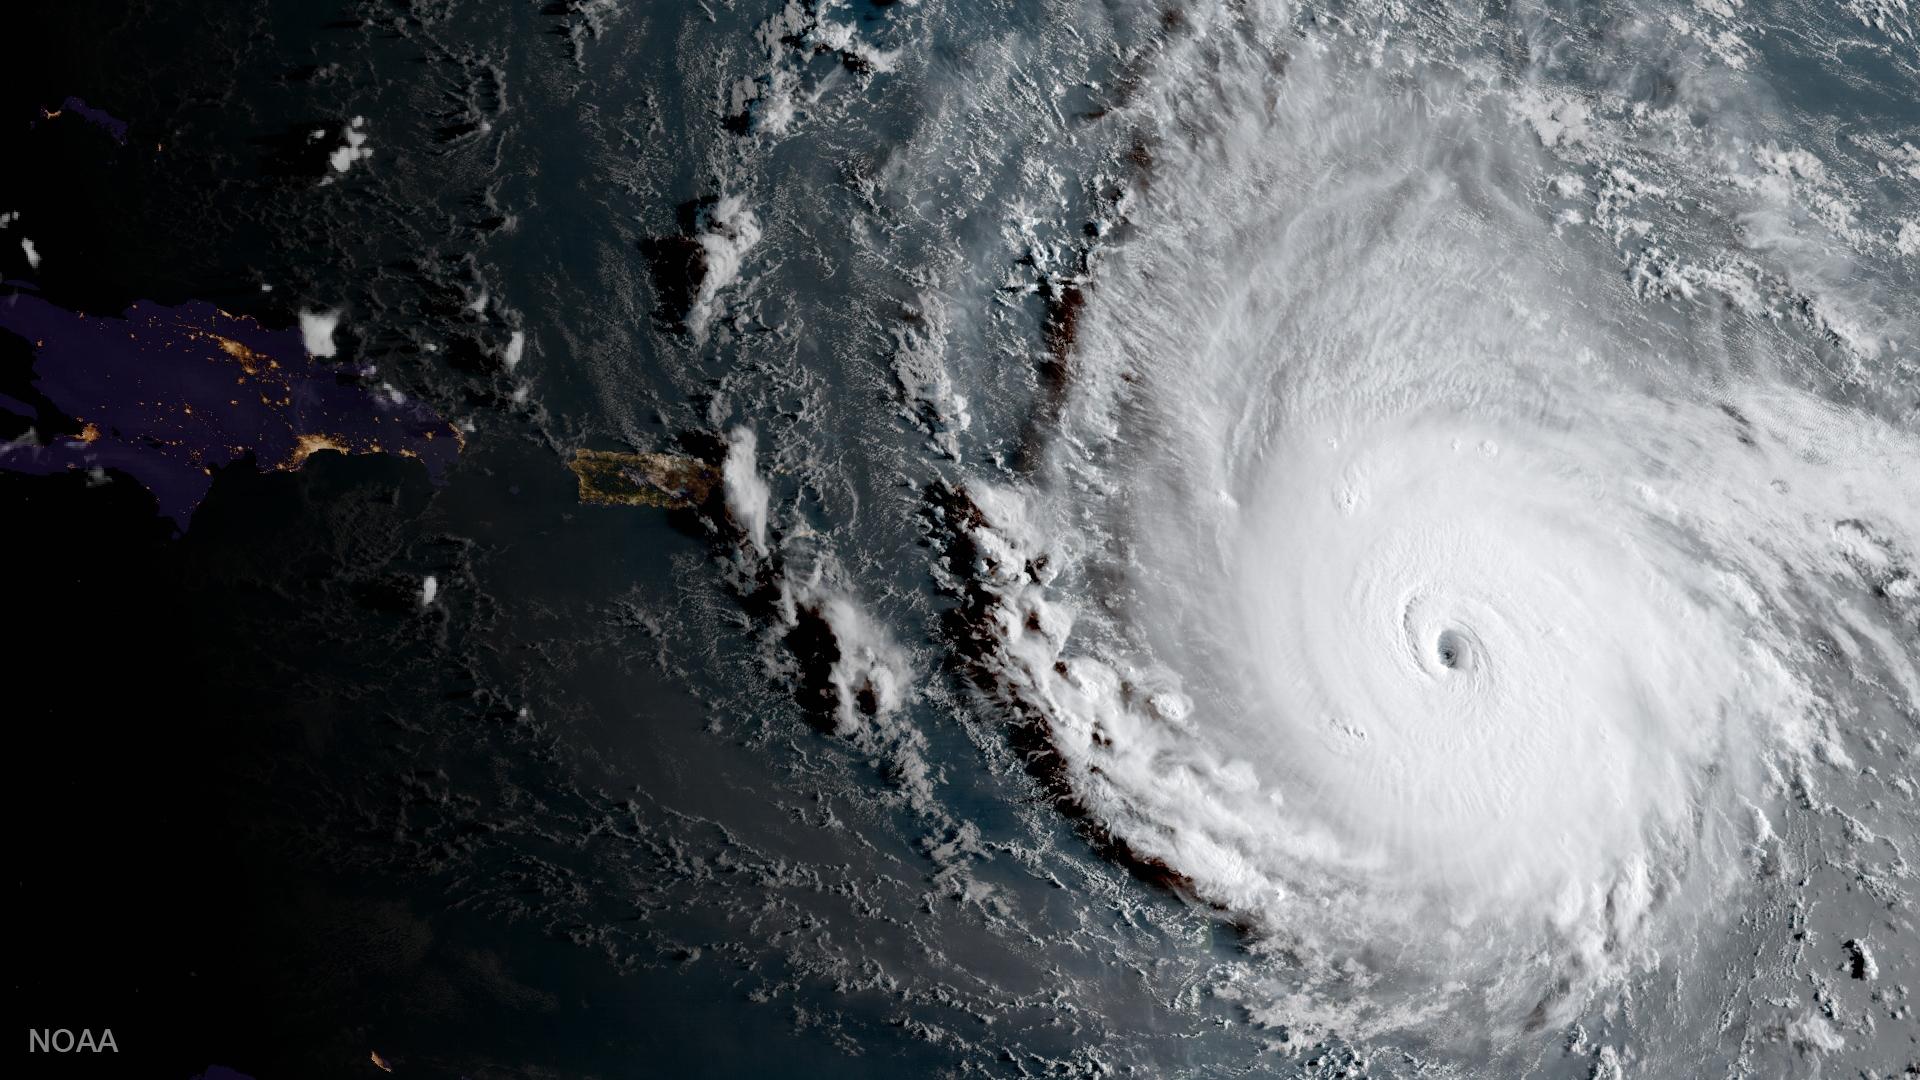 16 million in Hurricane Irma's path as it barrels through Caribbean